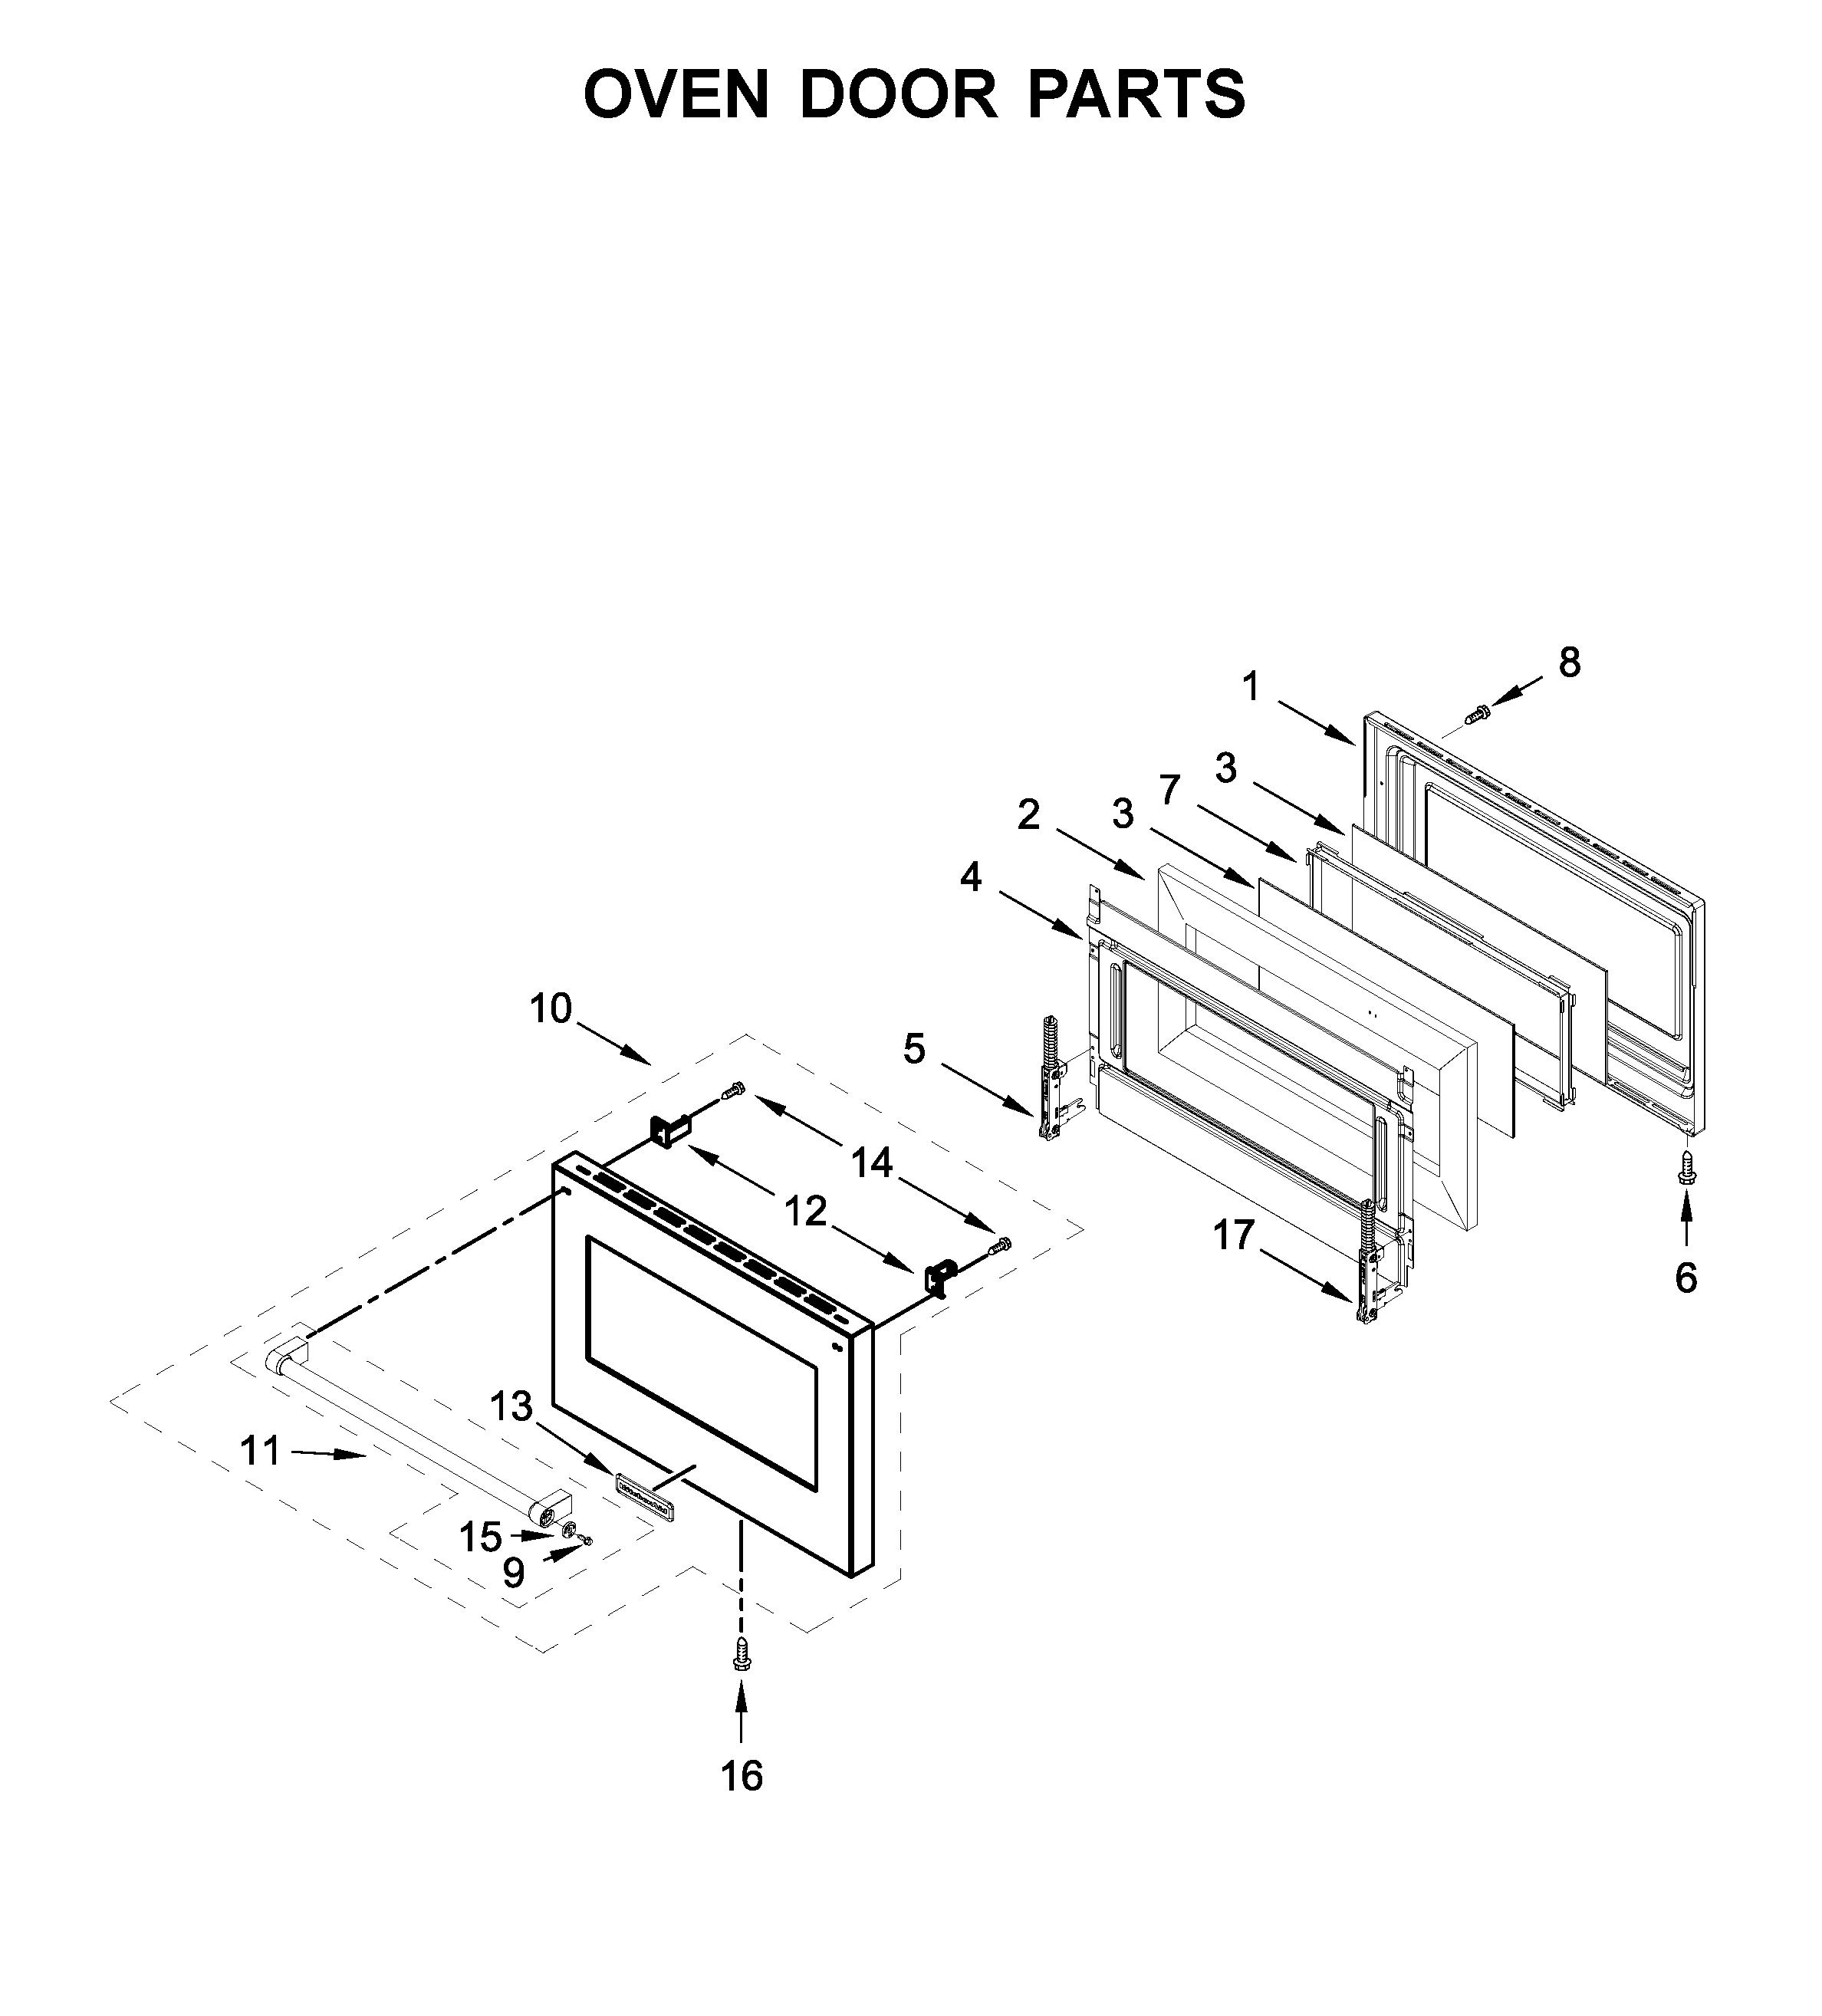 Kitchenaid  Gas Range  Oven door parts